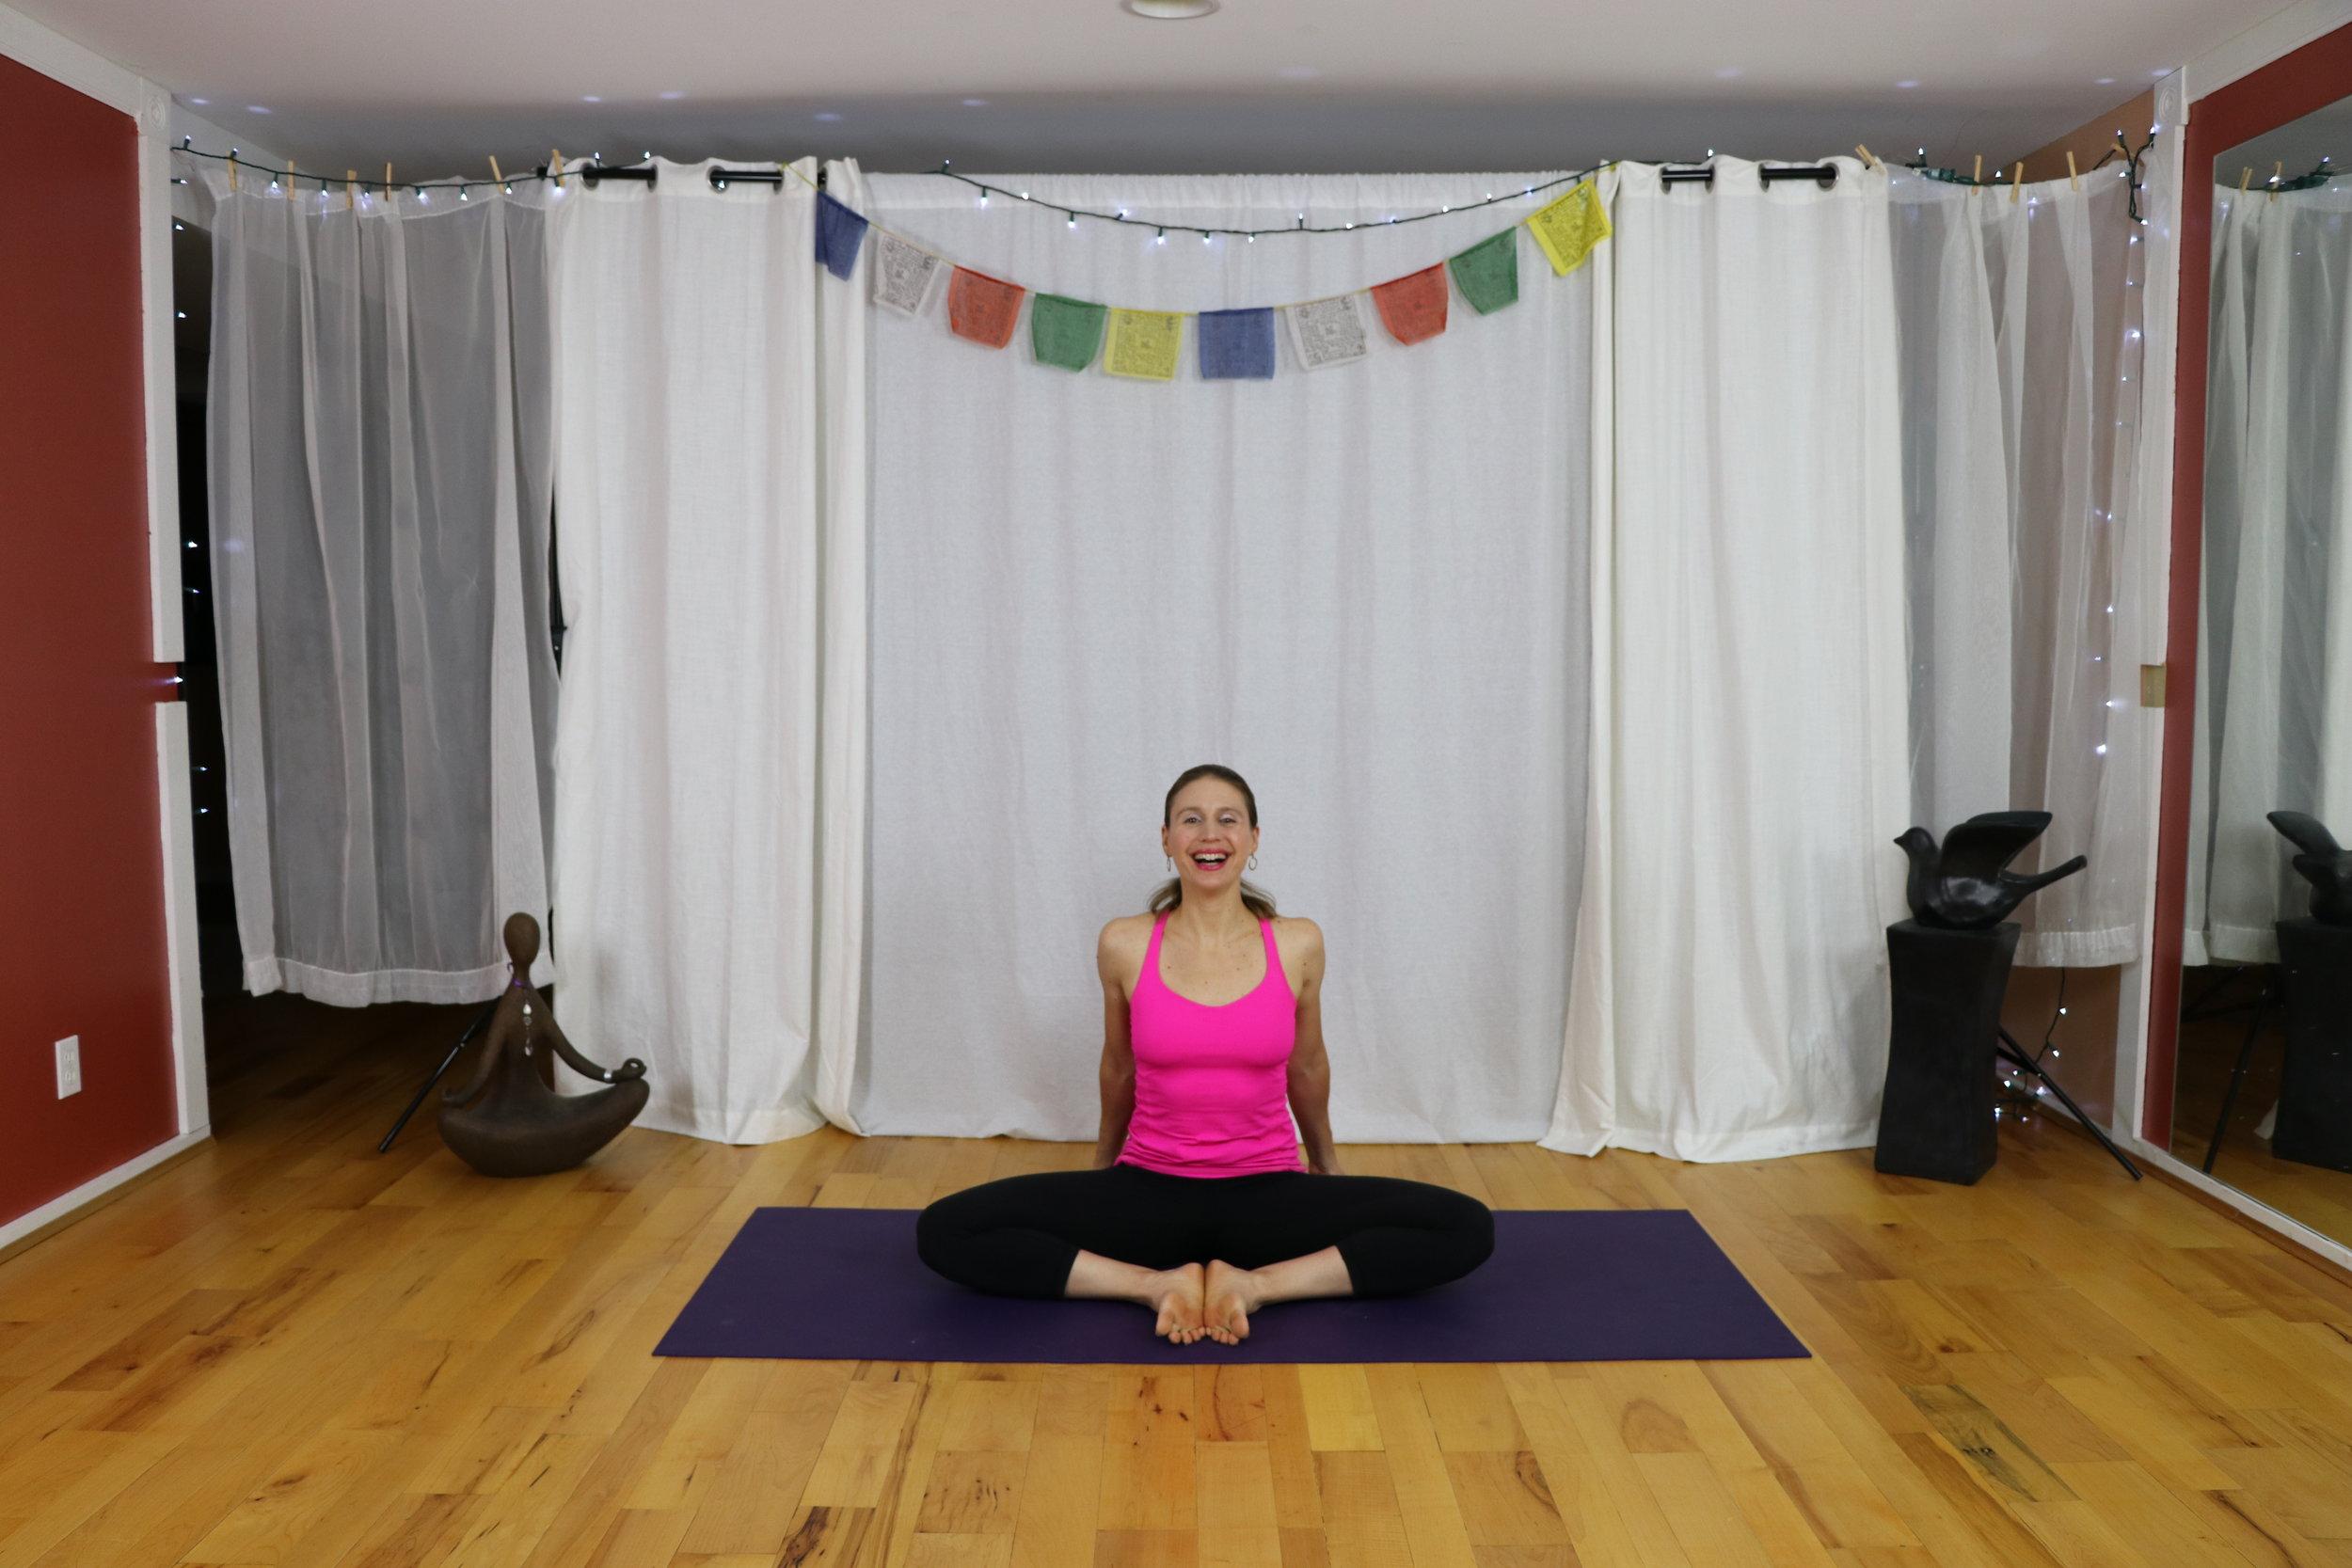 yoga for tight stiff hips baddha konasana/butterfly pose/bound angle pose yoga with irena miller www.irenamiller.com